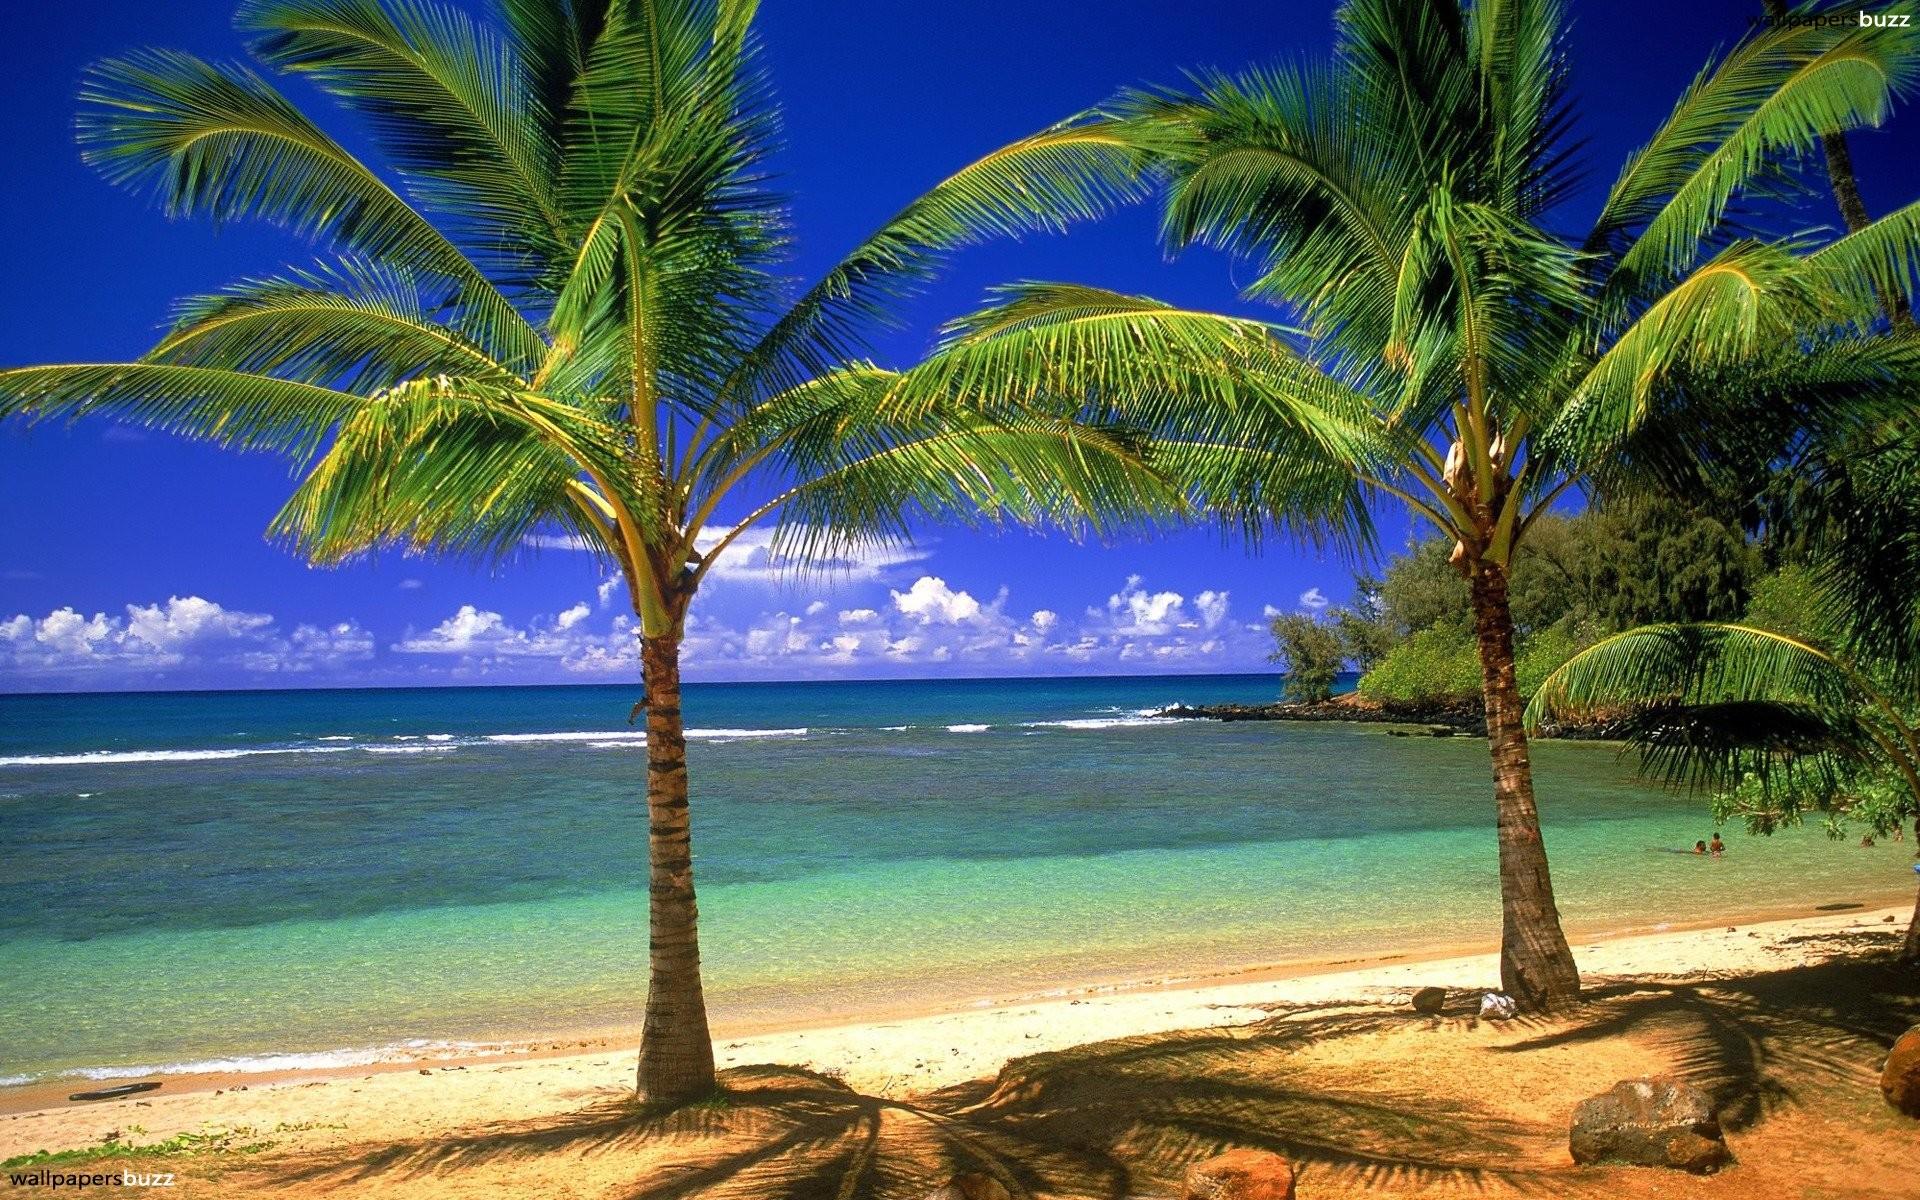 Two palms on a beach HD Wallpaper